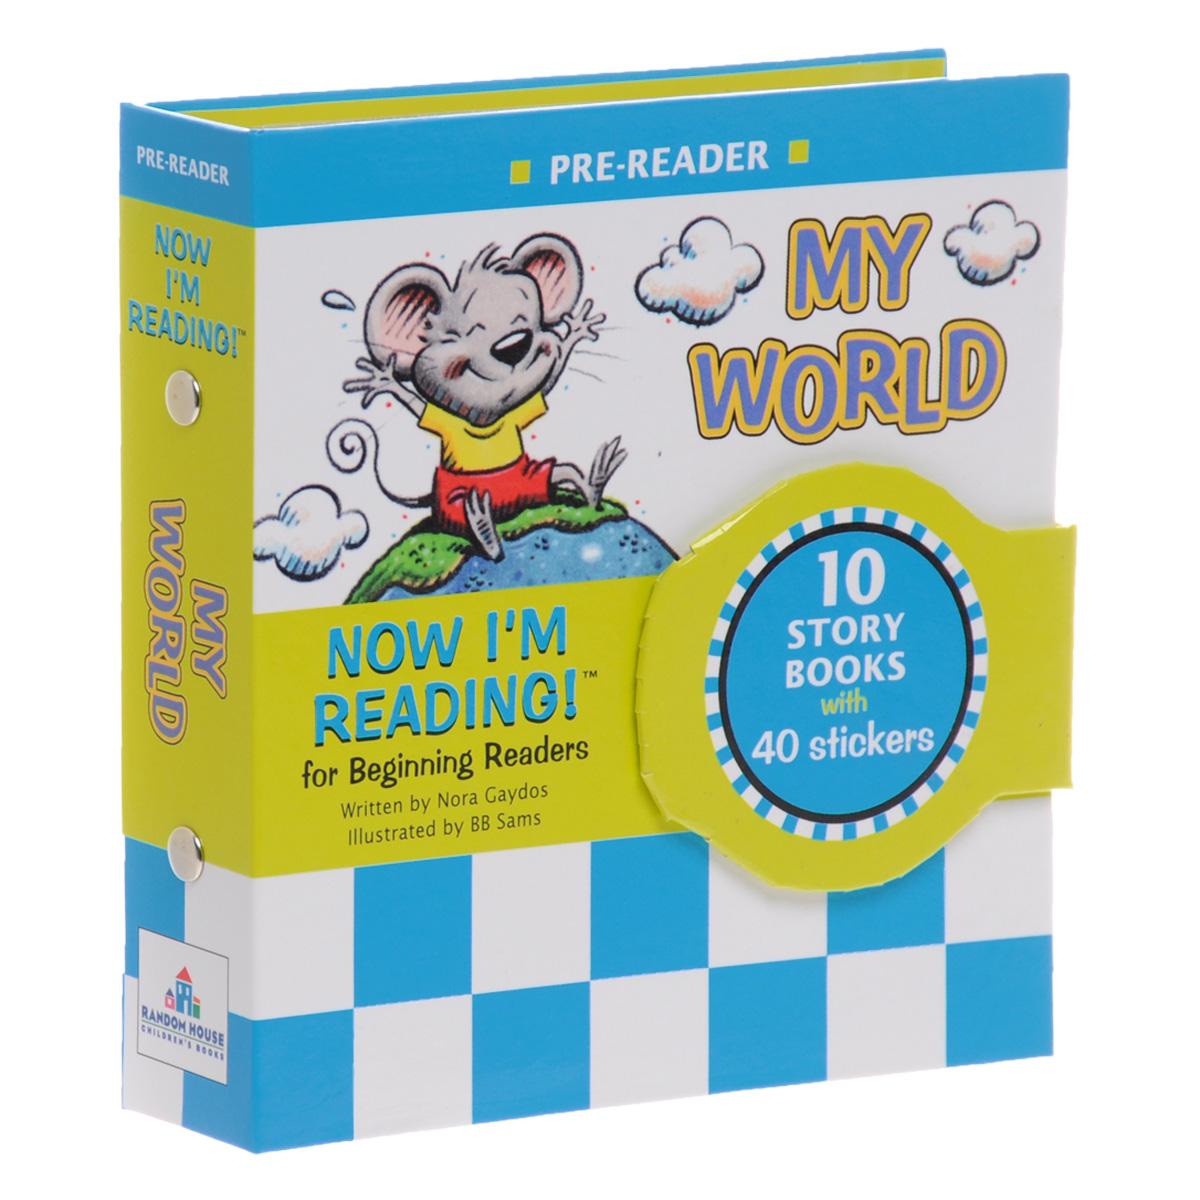 Now I'm Reading! Pre-Reader: My World (комплект из 10 книг + наклейки) reader self efficacy and reading instruction